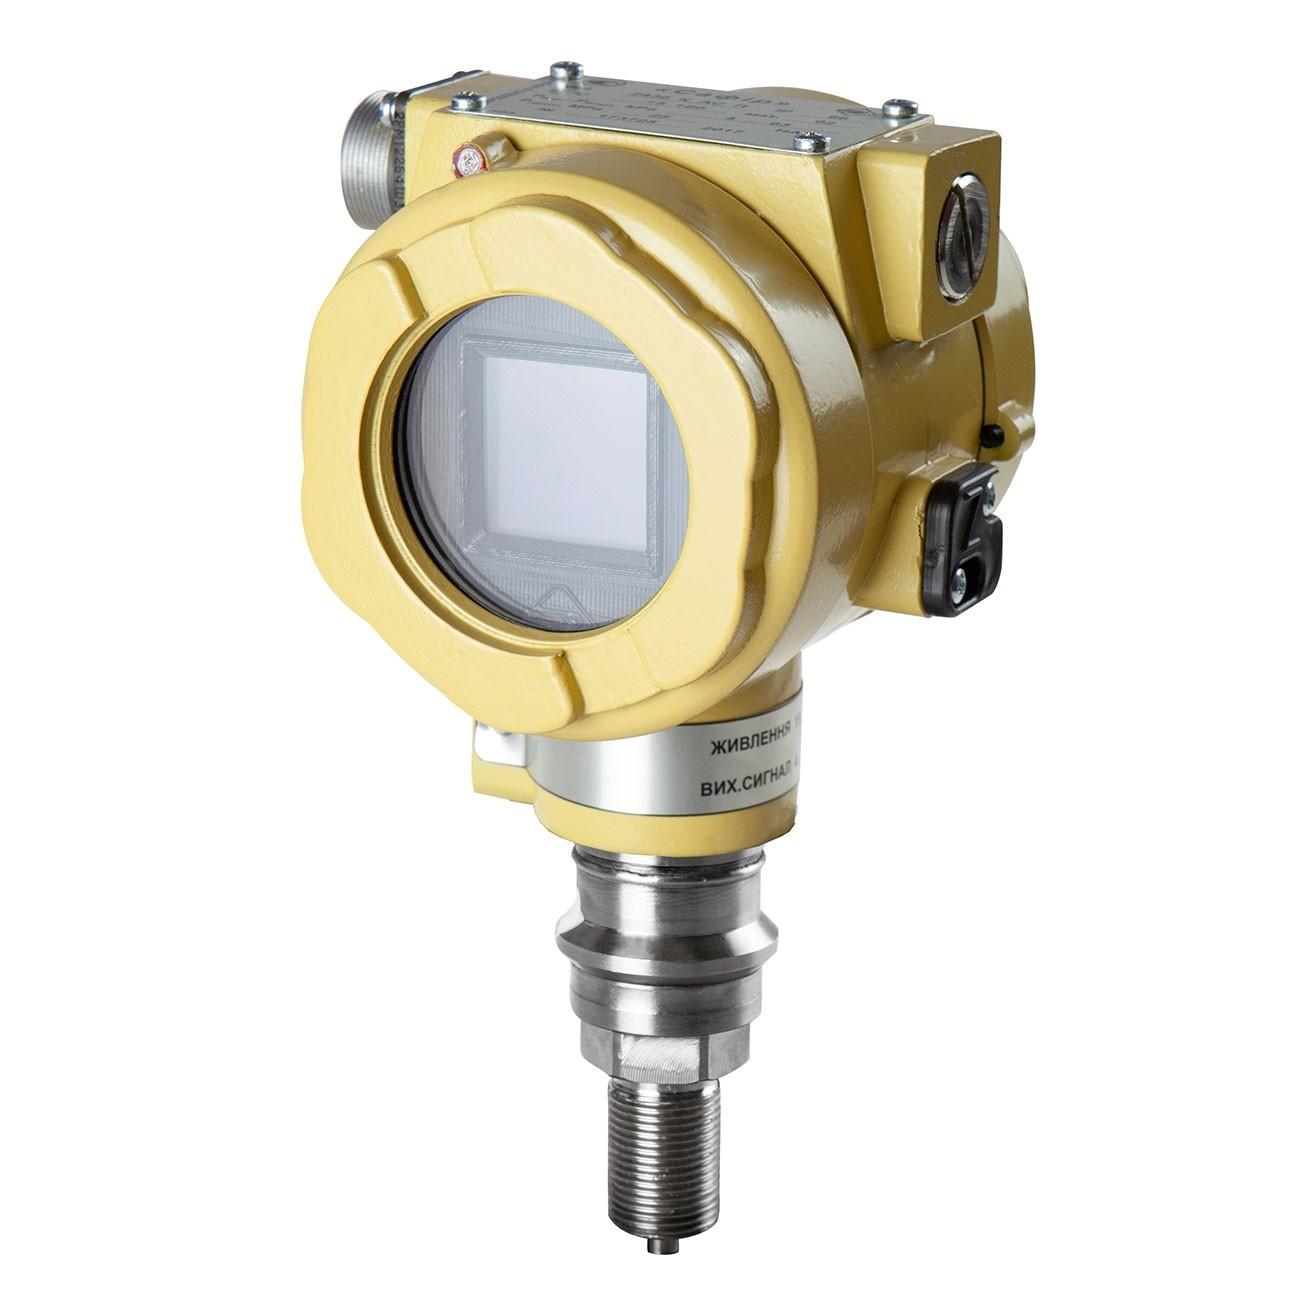 Smart Absolute Pressure Transmitters Safir 2030, 2040, 2050 K